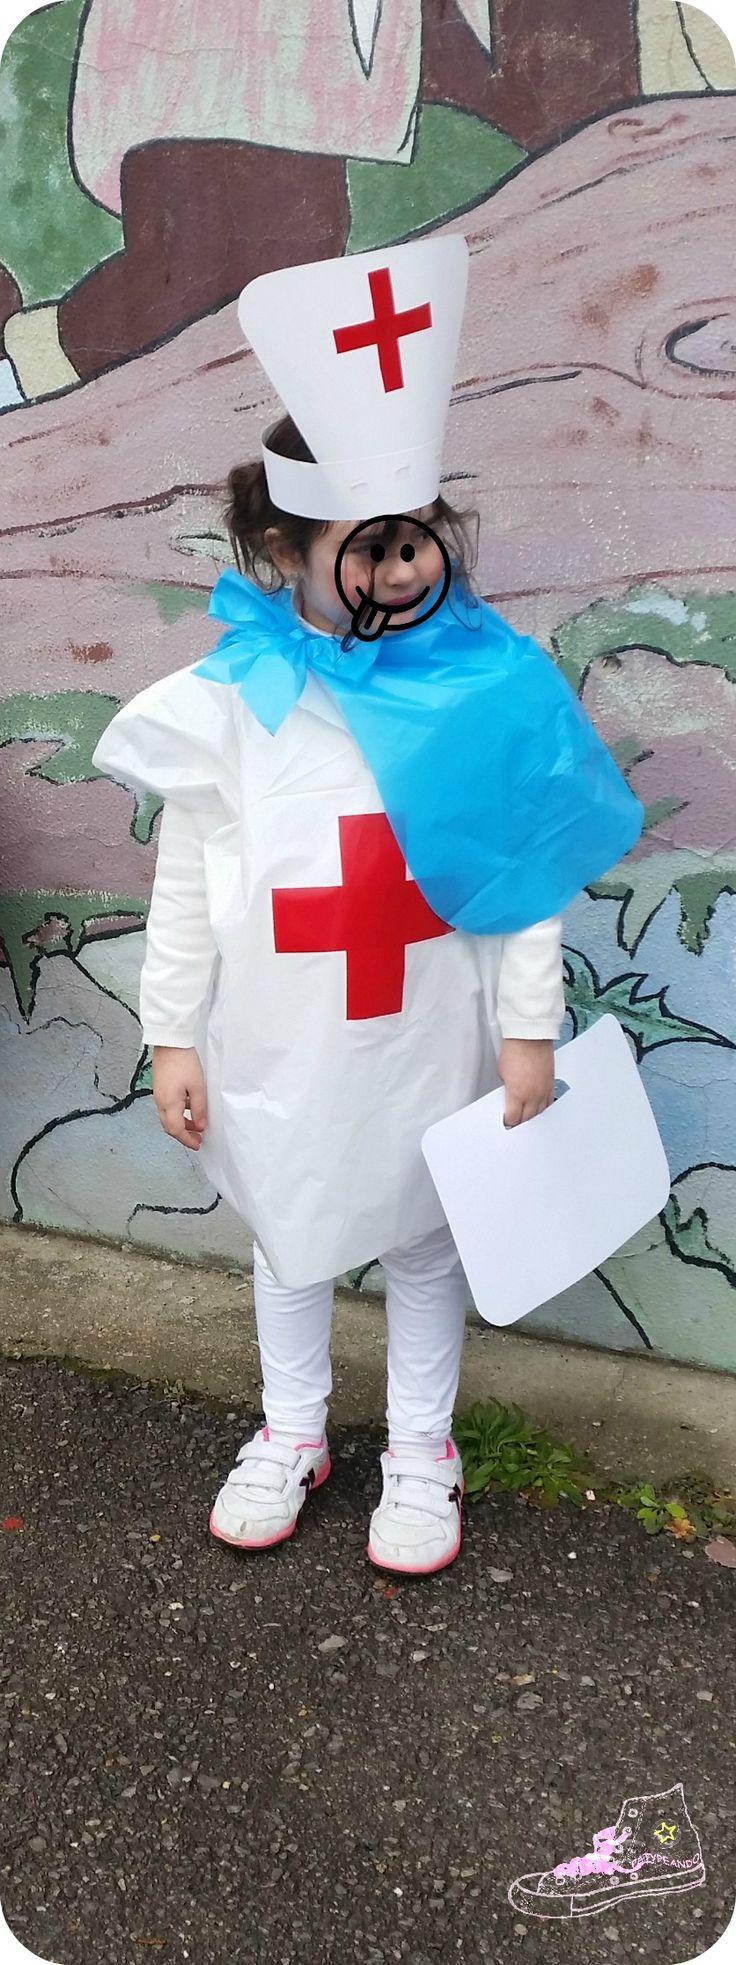 Disfraz fácil de enfermera con bolsa blanca de basura http://www.multipapel.com/familia-material-para-disfraces-maquillaje-bolsas-de-color.htm